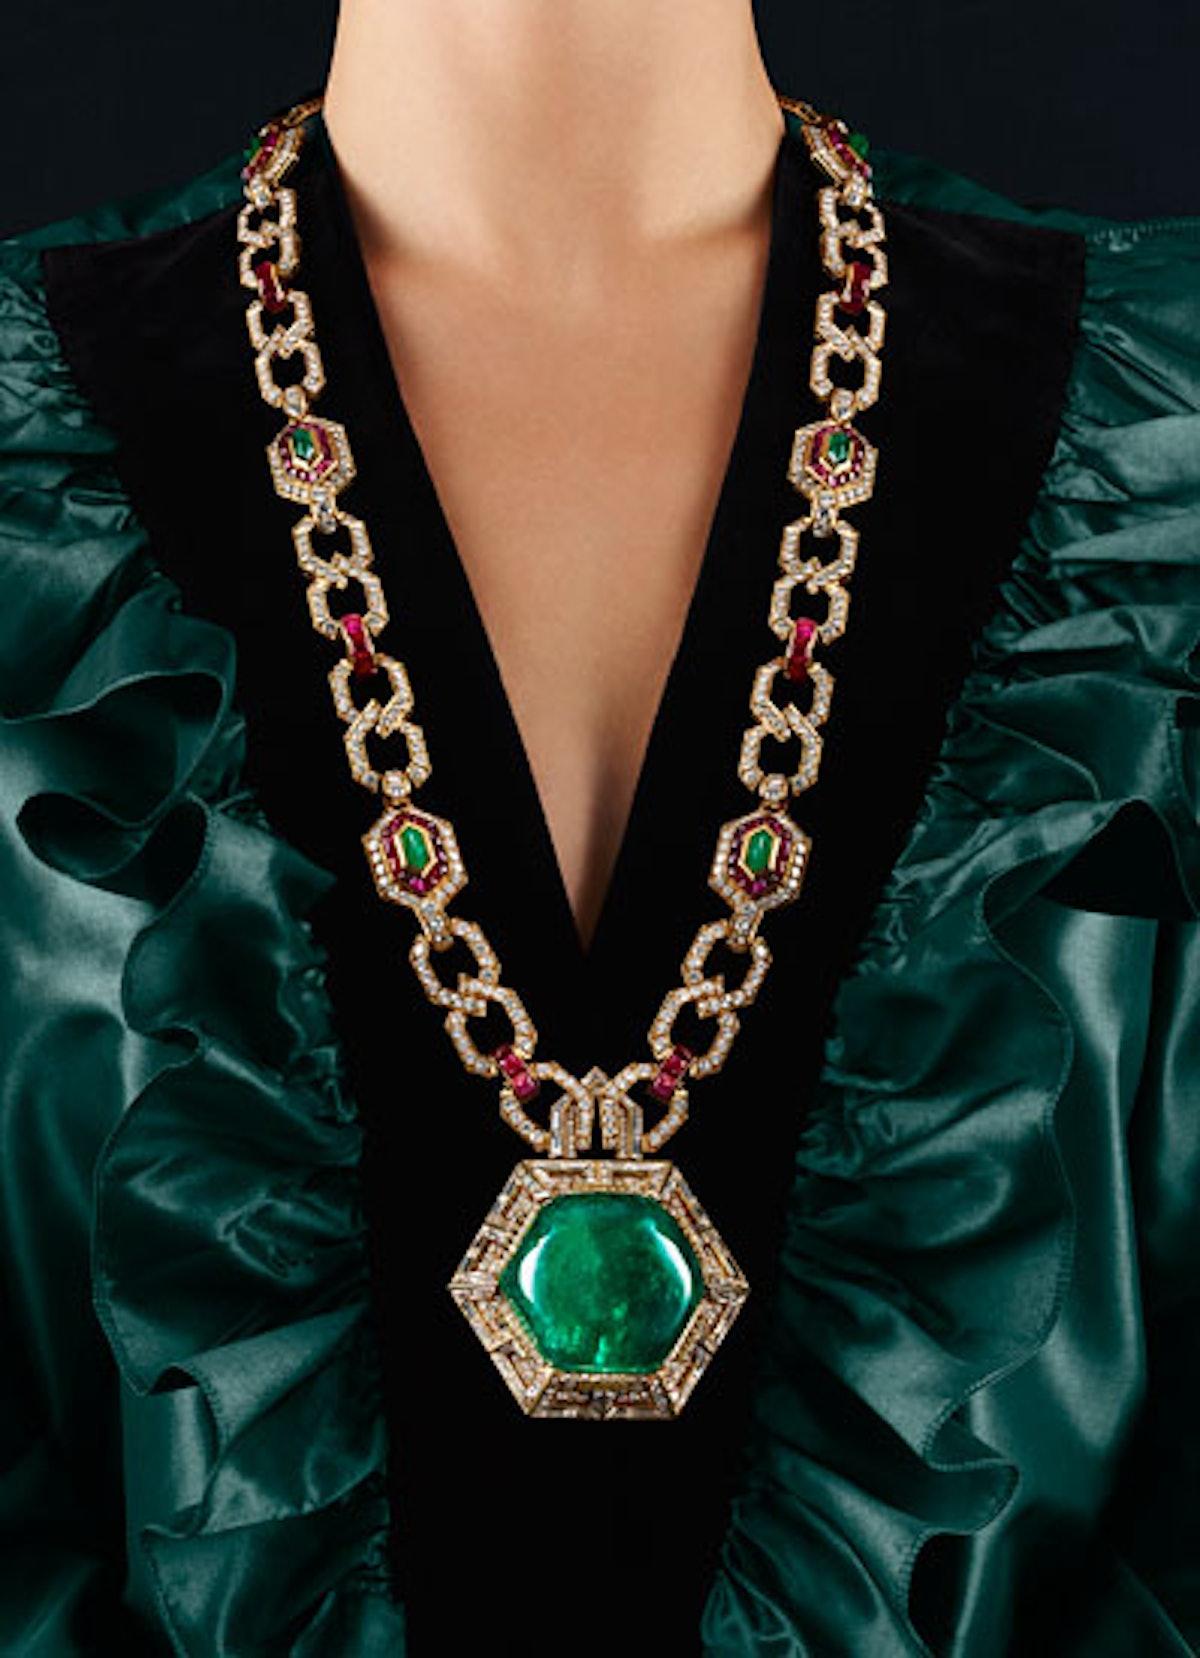 acss-decades-costume-jewelry-01-v.jpg